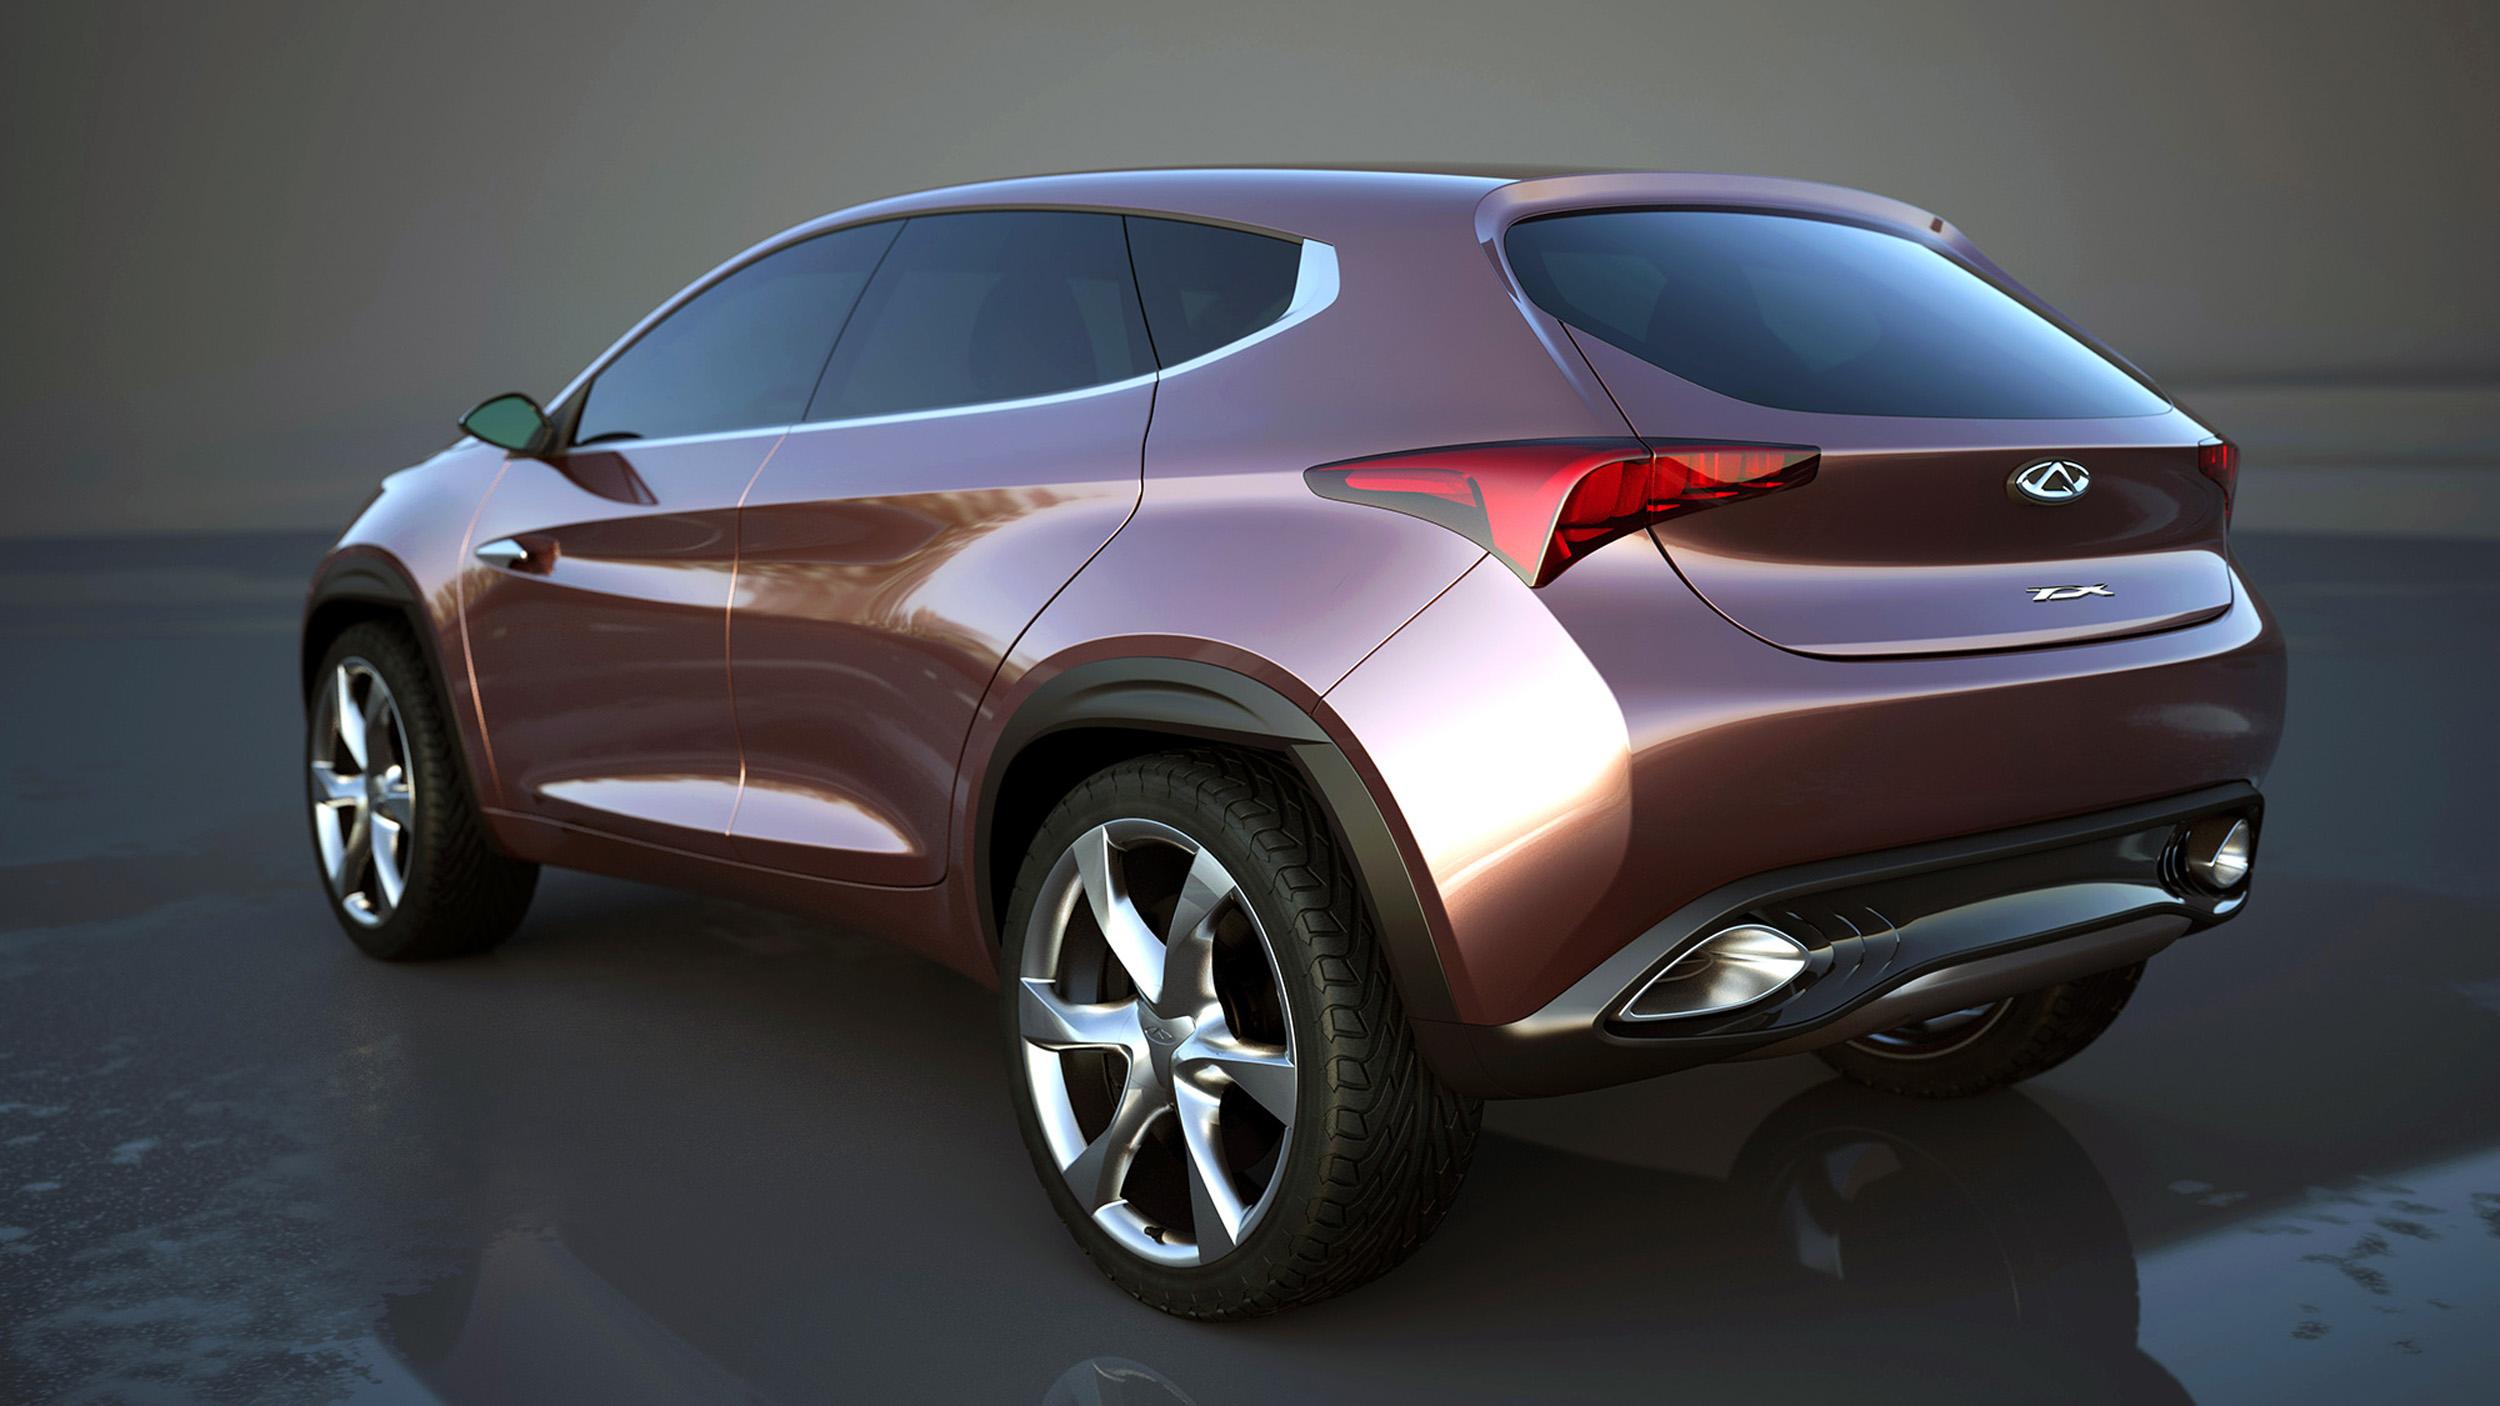 Chery-TX-concept-car-2012.jpg